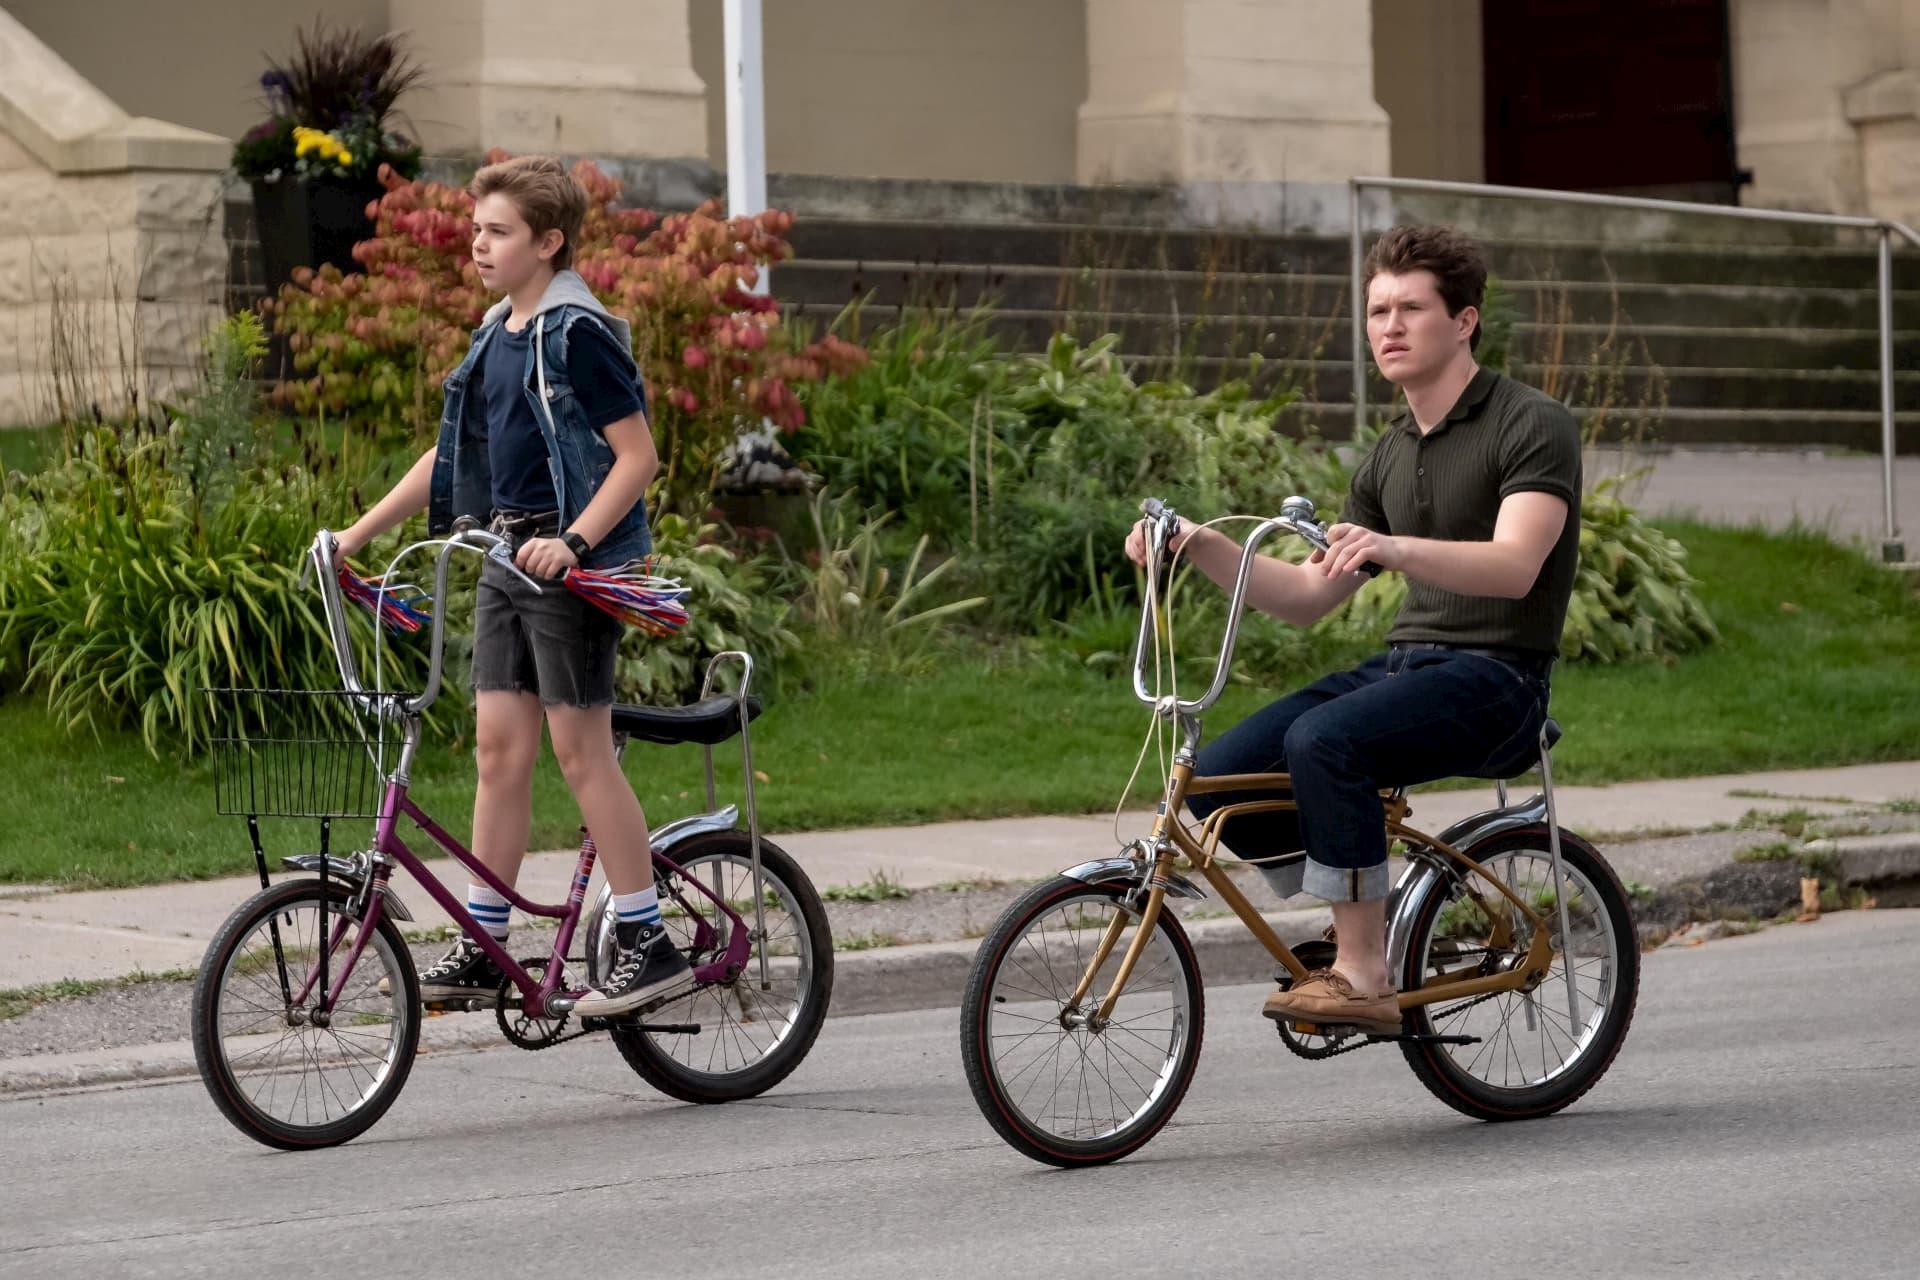 2 boys riding 80's vintage banana bikes